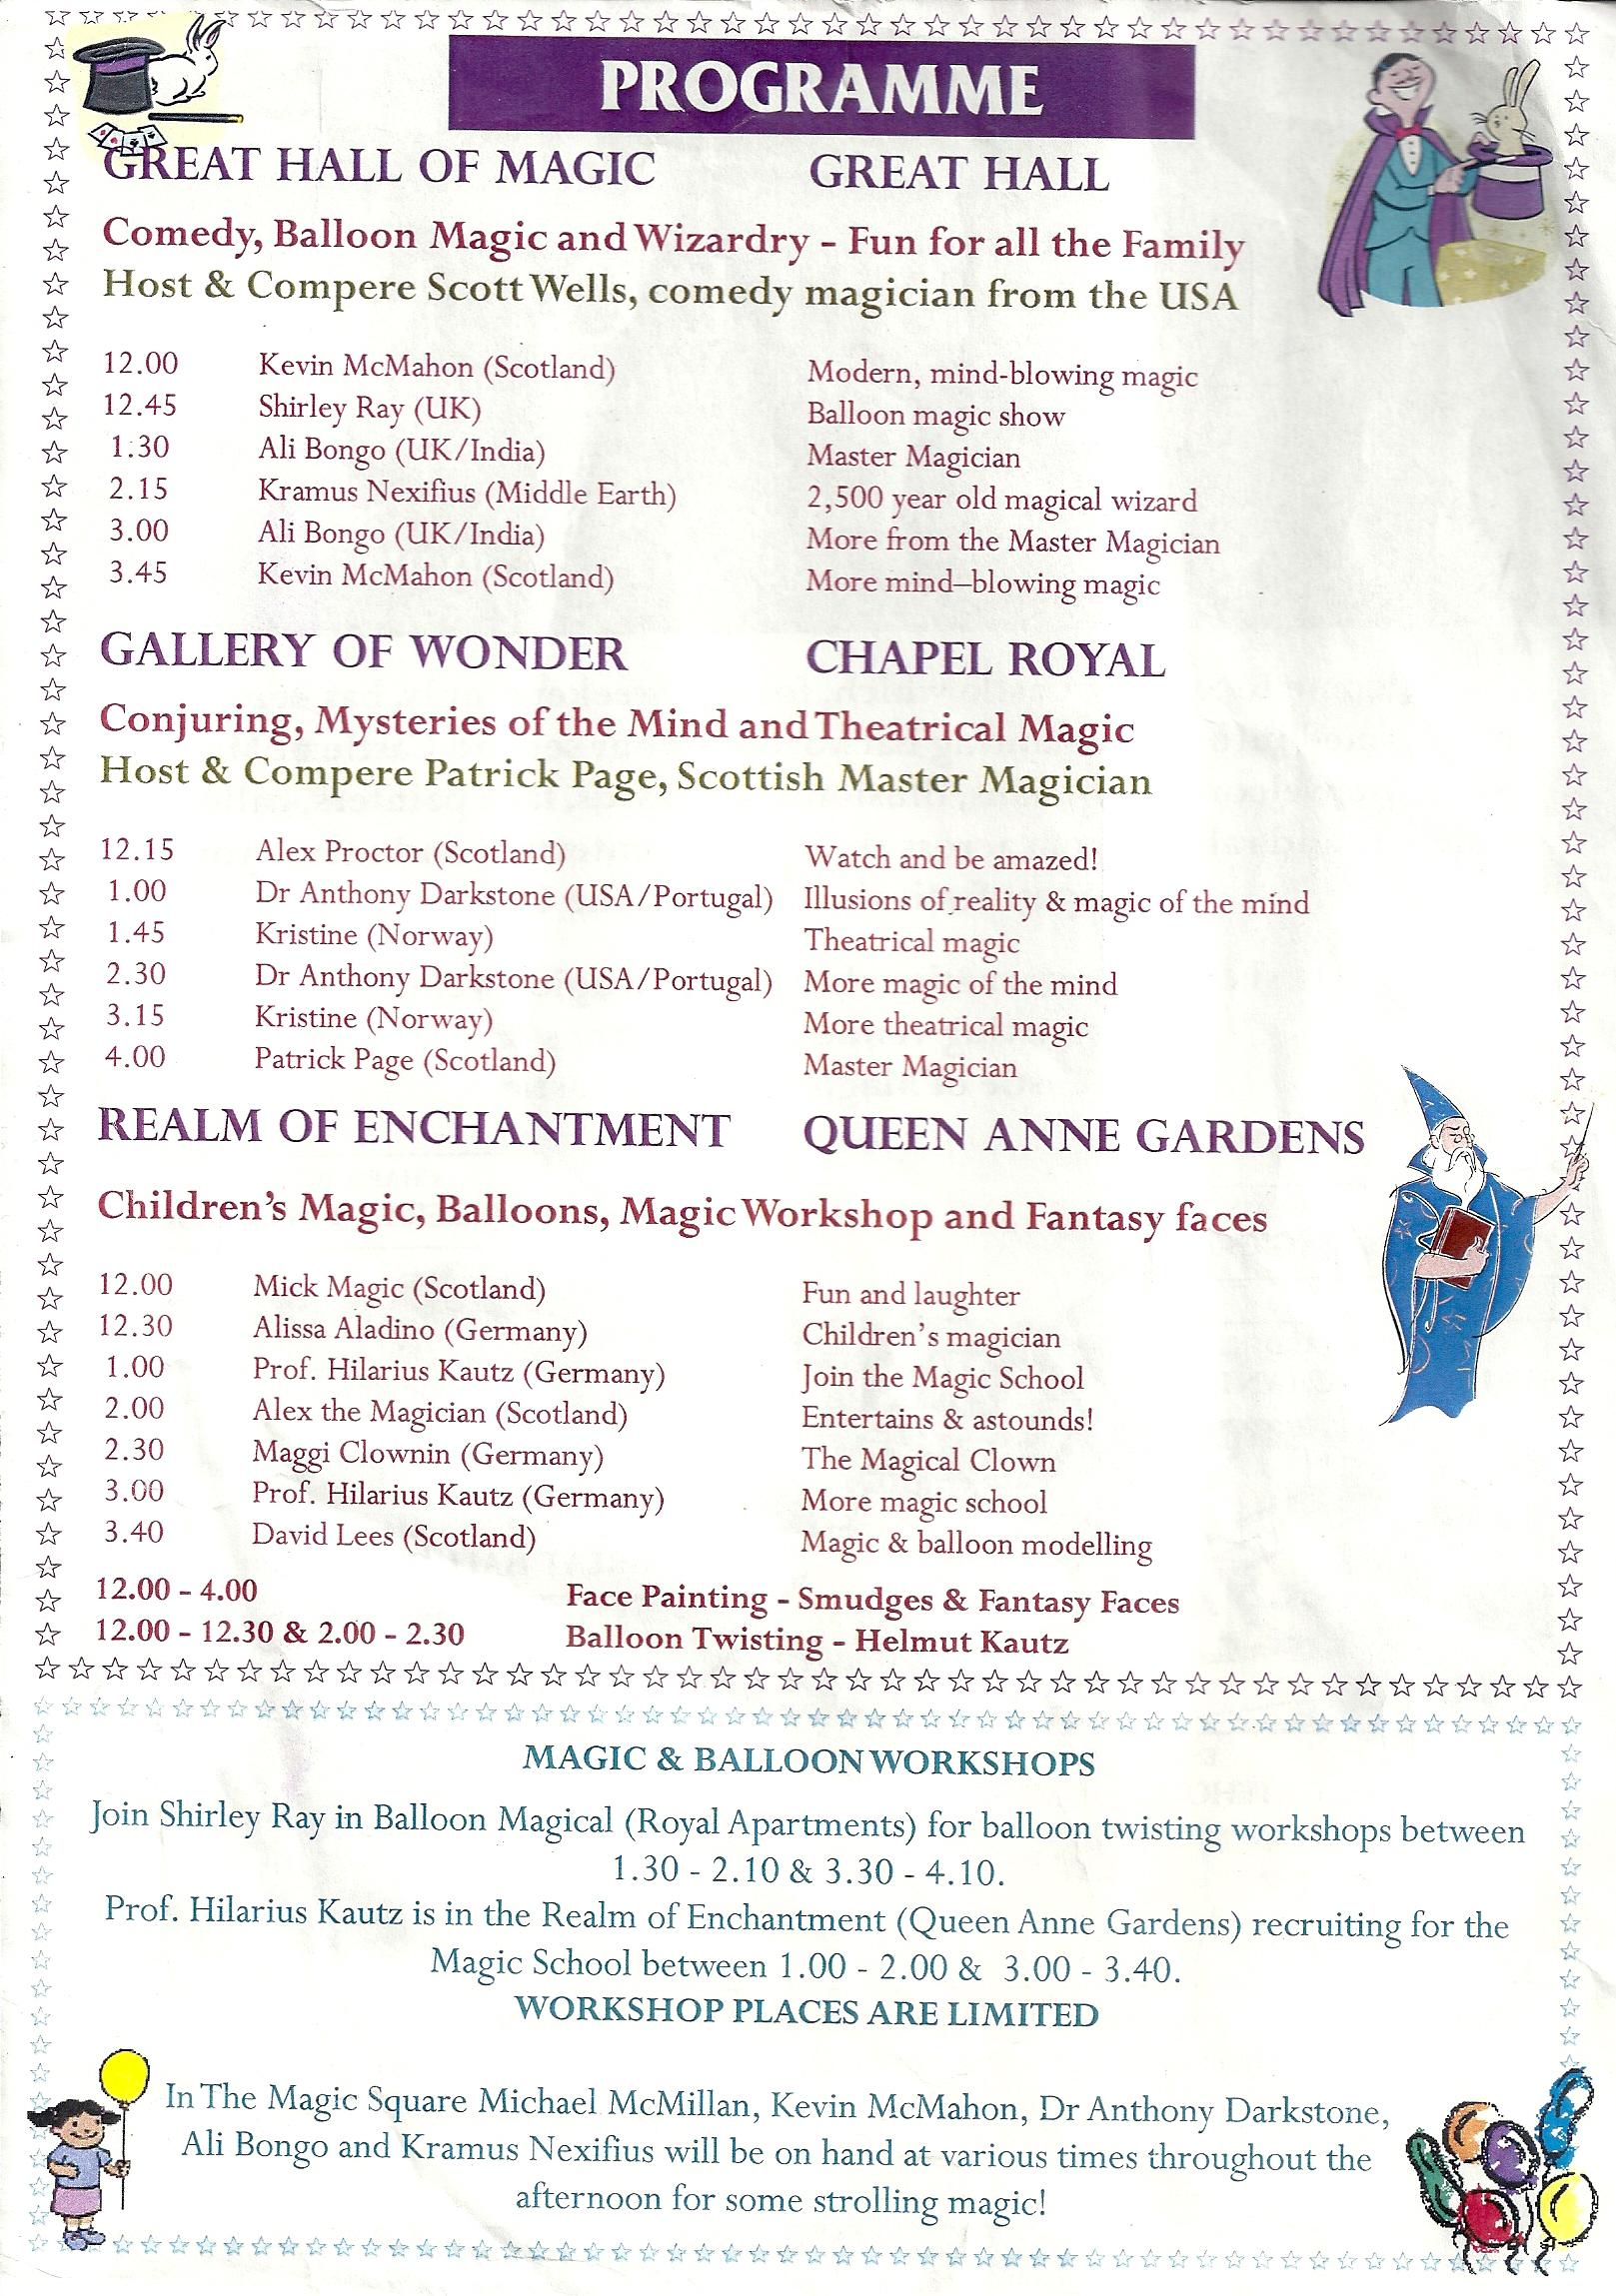 Castle of Magic Sorcerers' Return Scotland Magic Convention - Anthony Darkstone